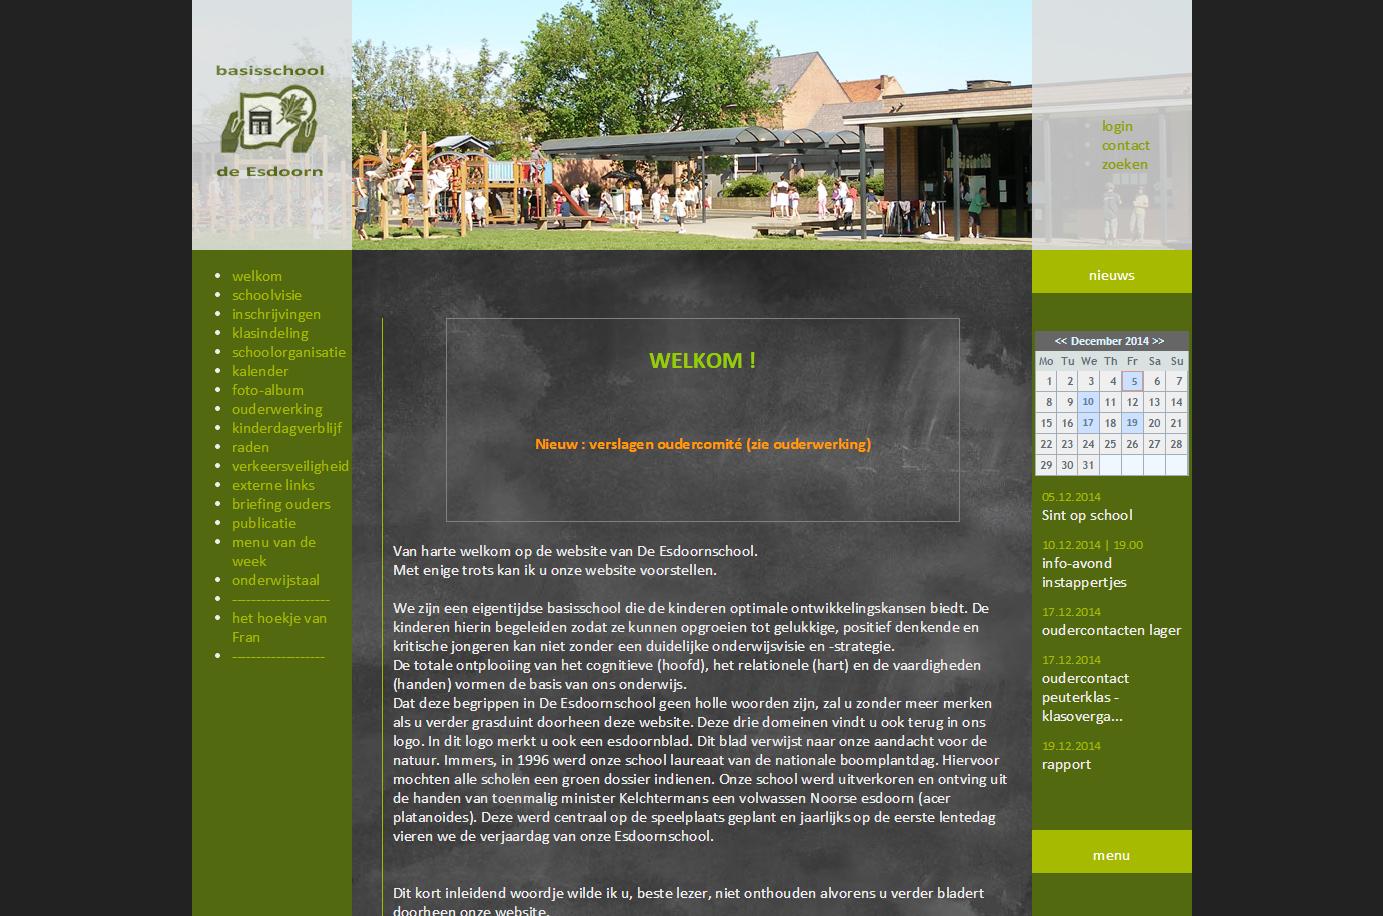 De Esdoornschool